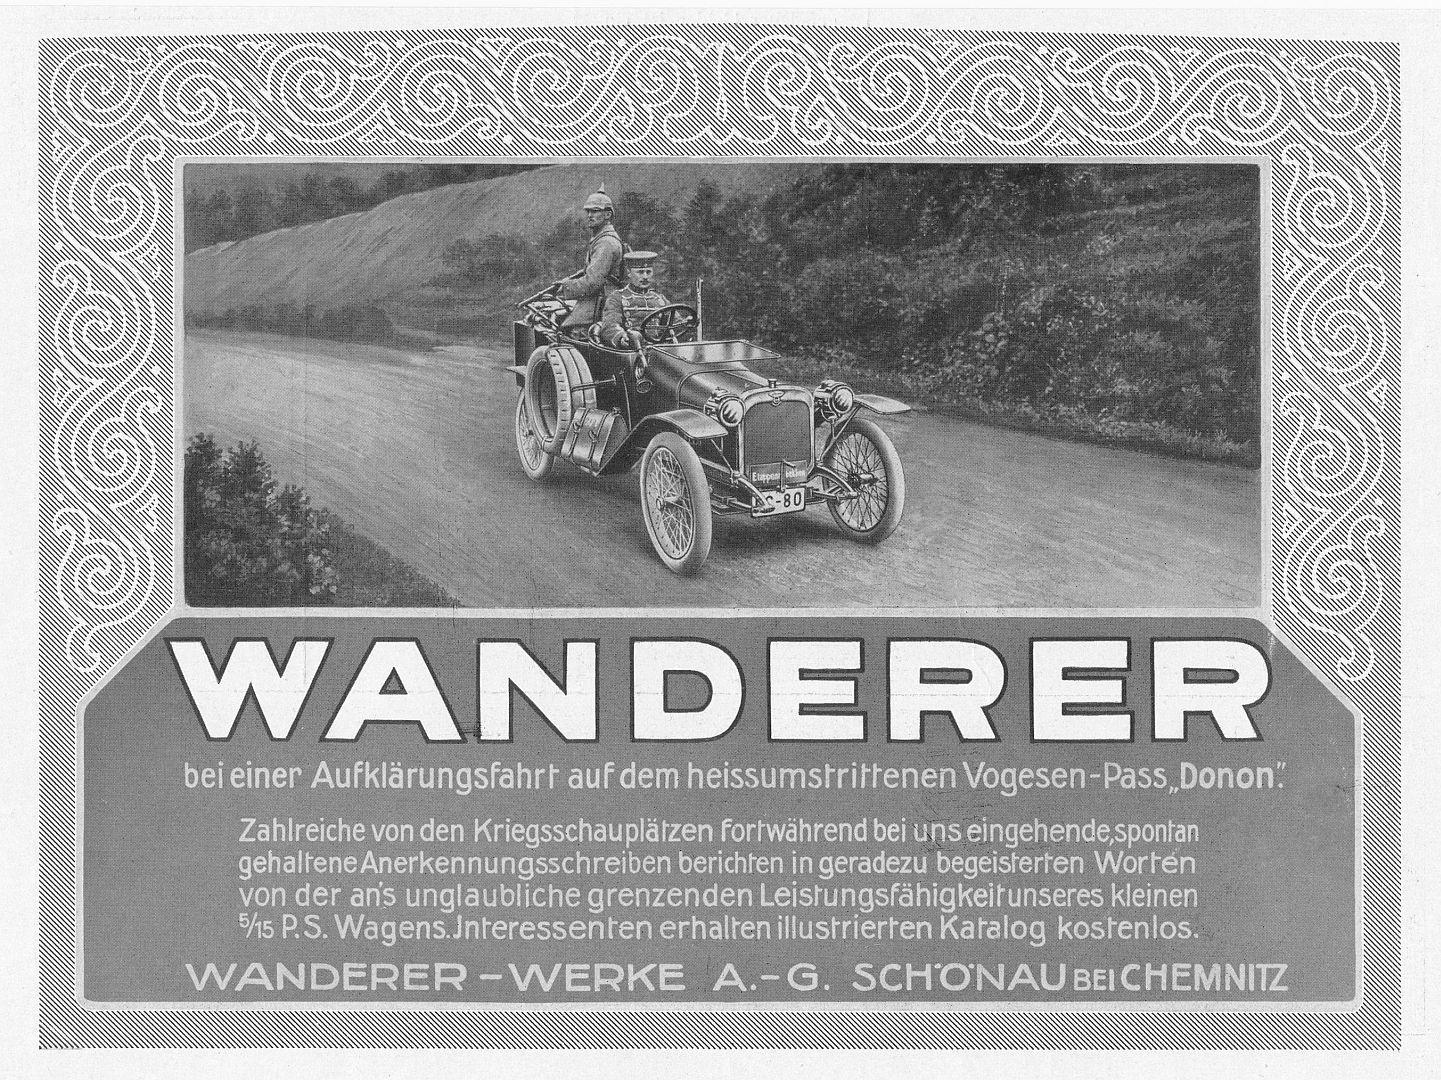 Wanderer_W3_5-15_PS_Vogesen_Donon-Pass_Reklame_August_1914_Galerie